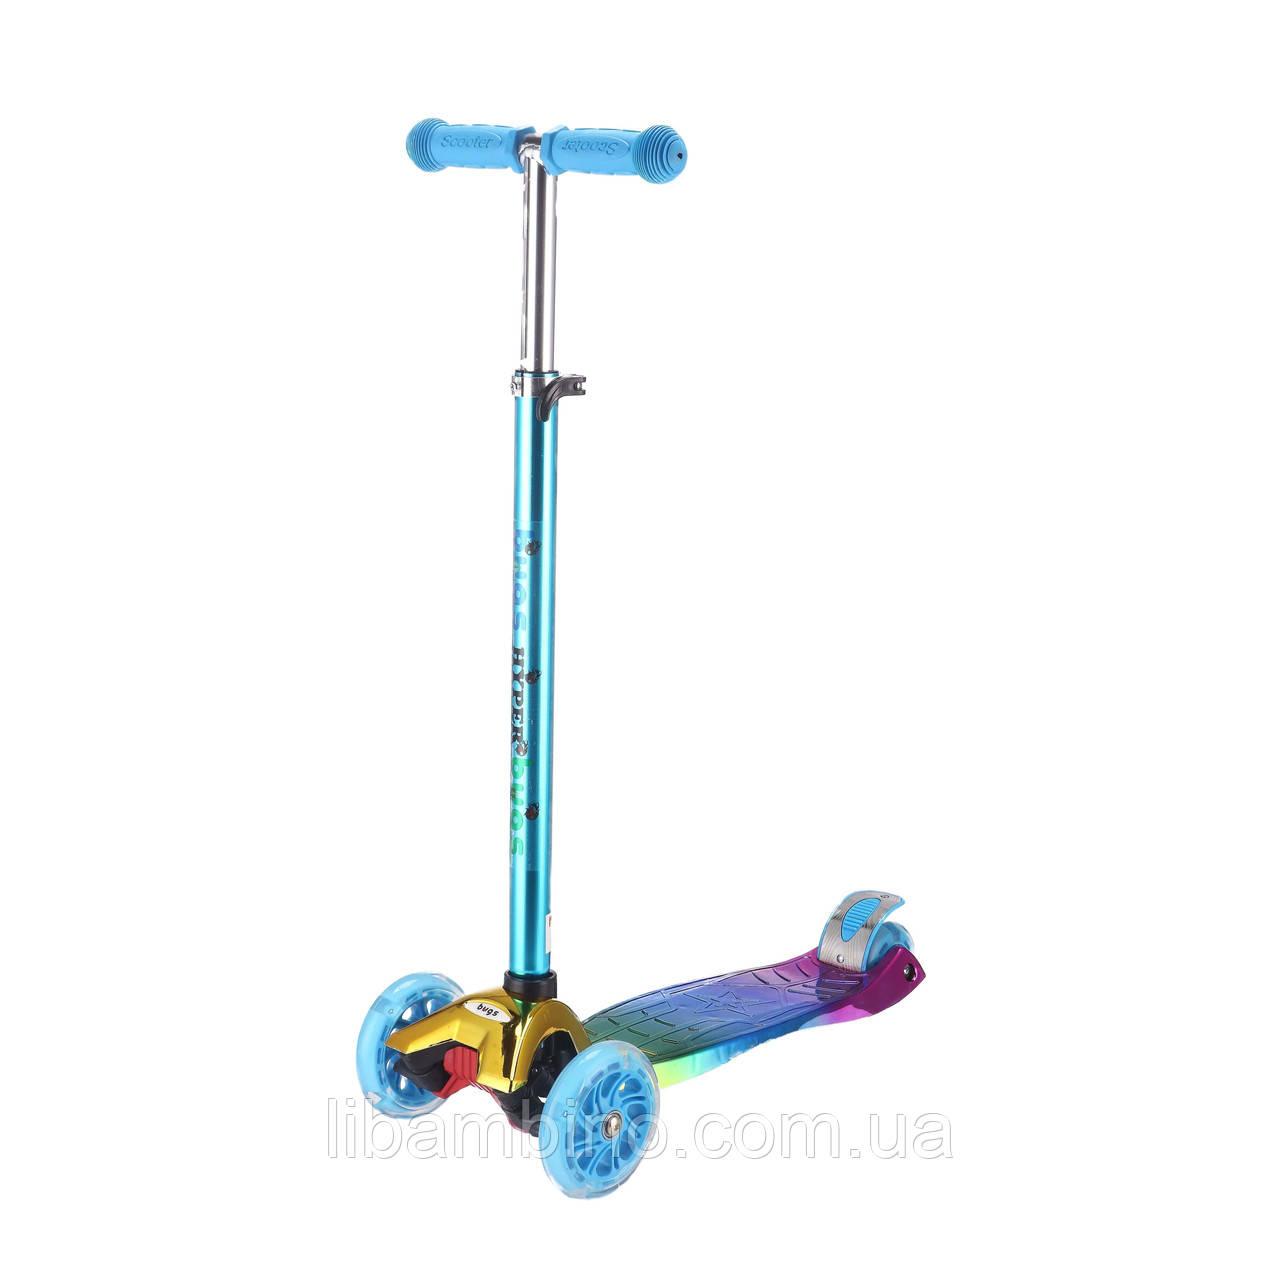 Дитячий самокат Bugs Hyper - Chameleon Blue Violet